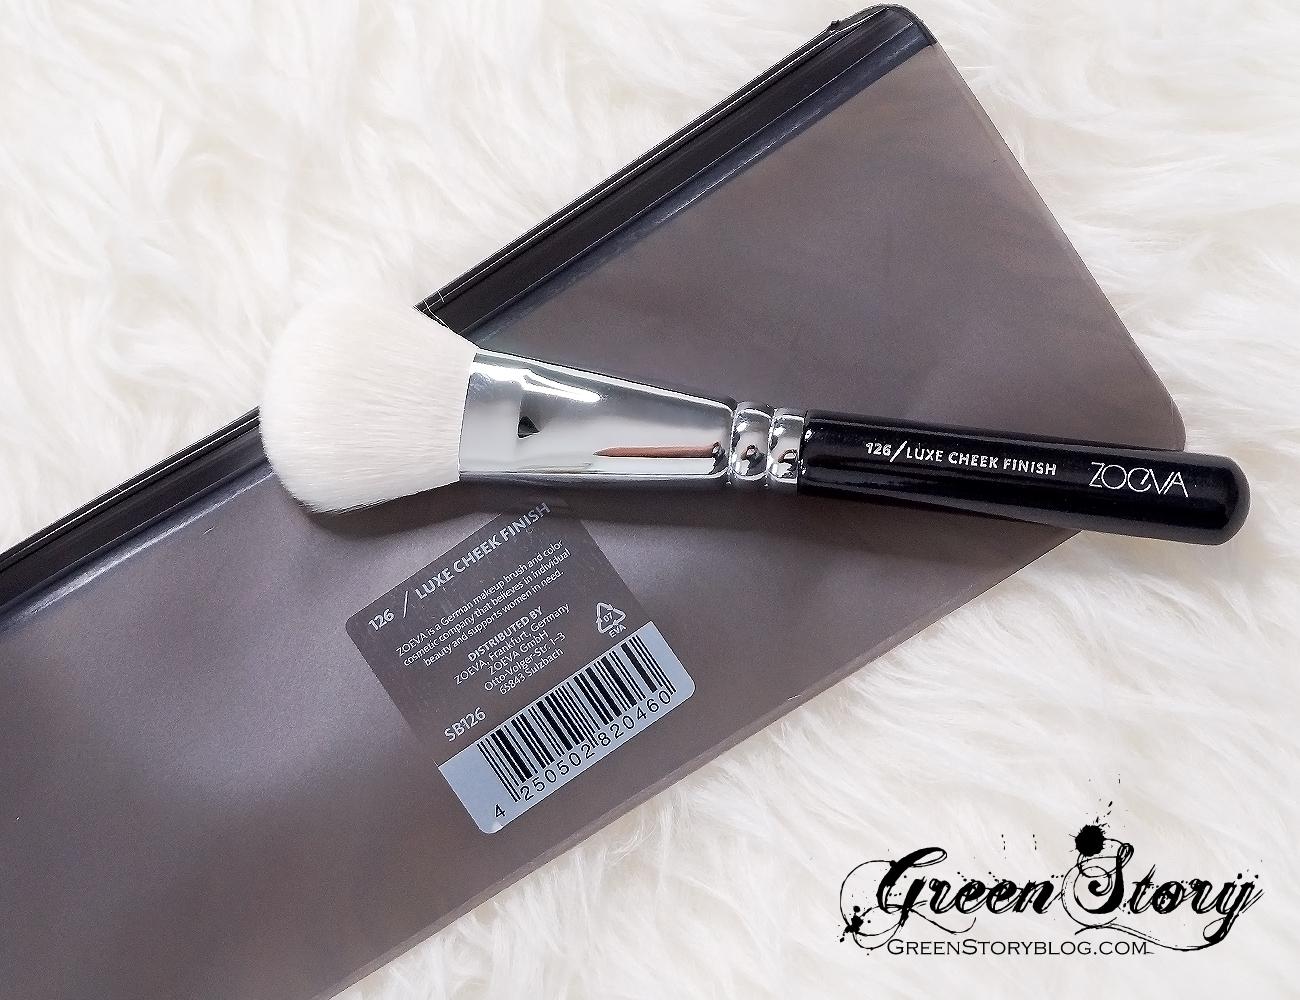 126 Luxe Cheek Finish Face makeup brush